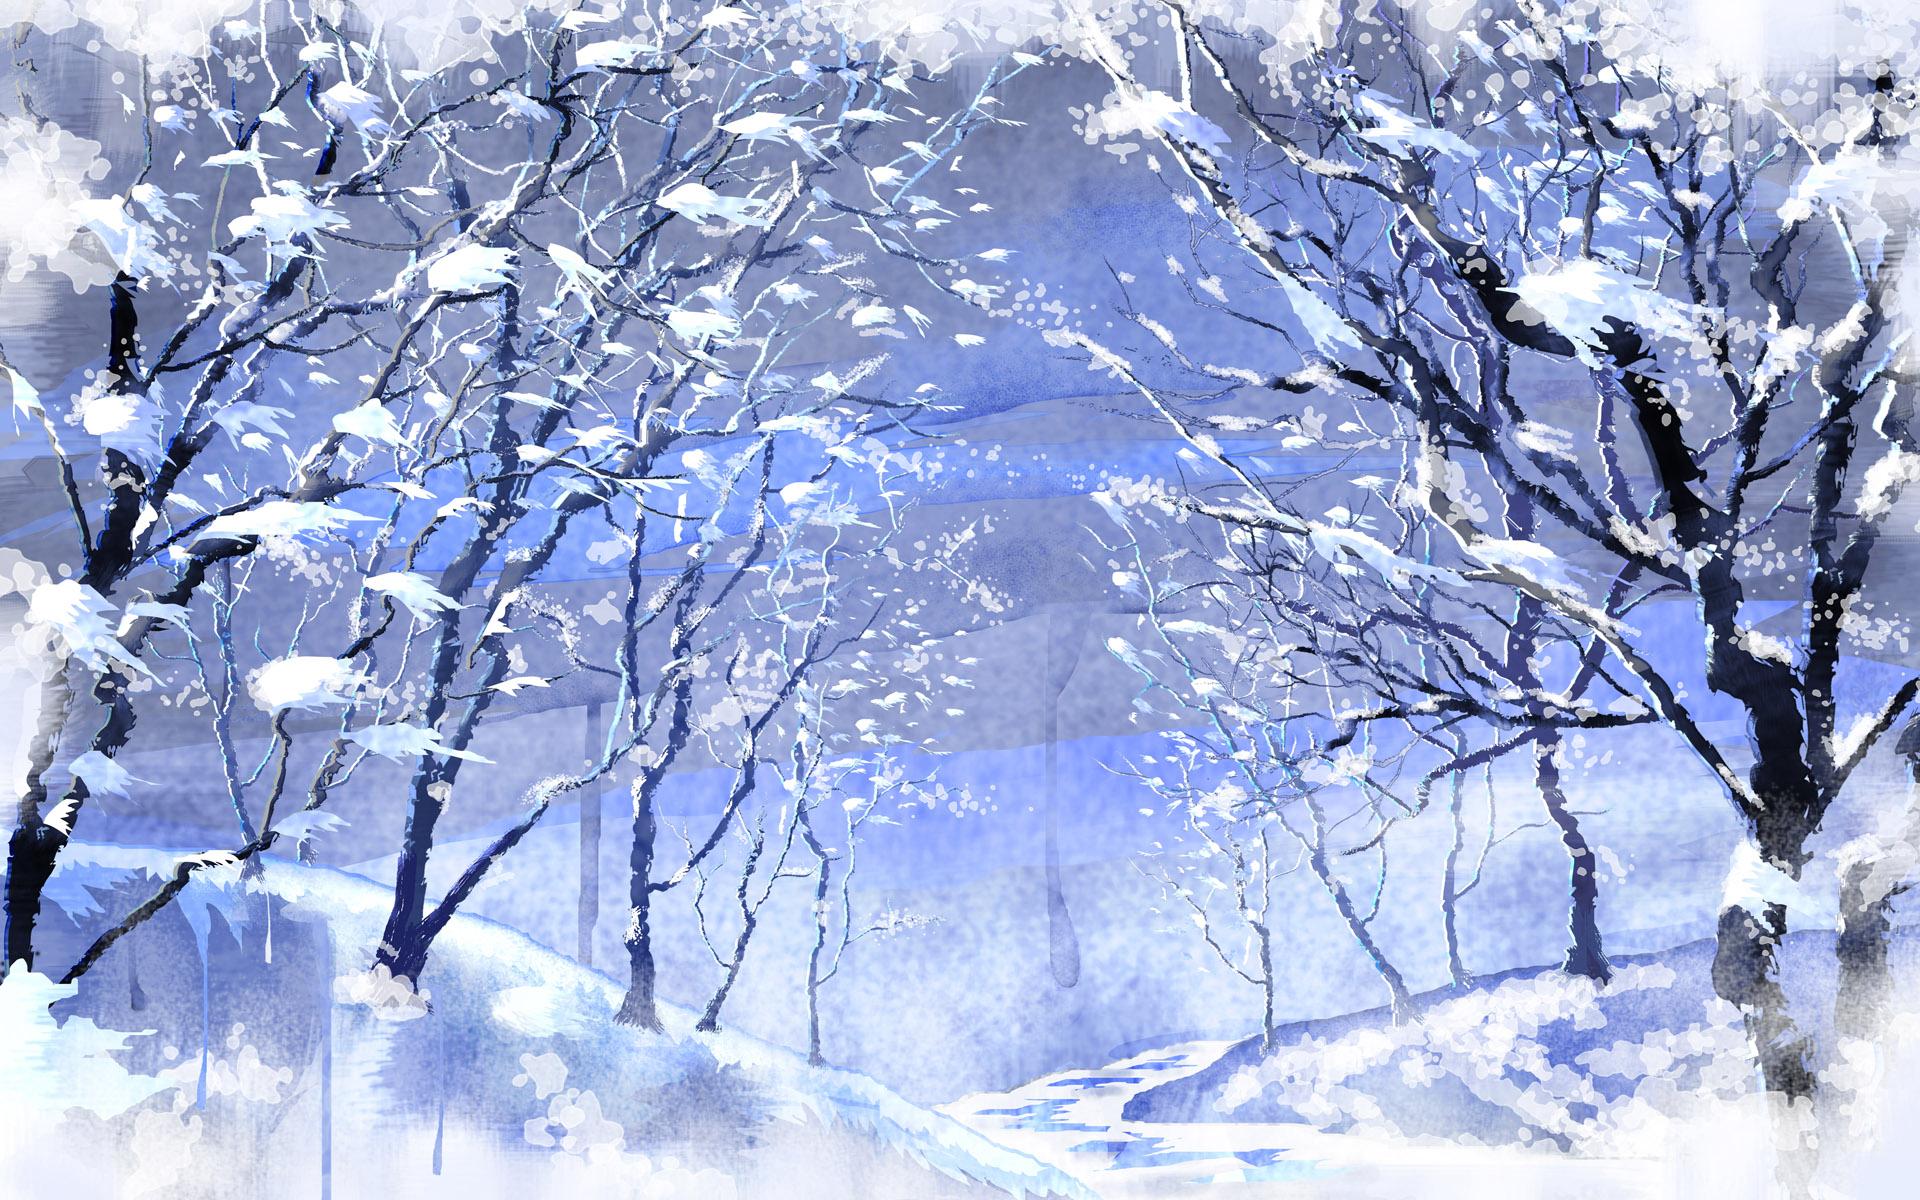 Winter Scene Wallpaper, Free Winter Scene Wallpaper, Christmas Scenery ...